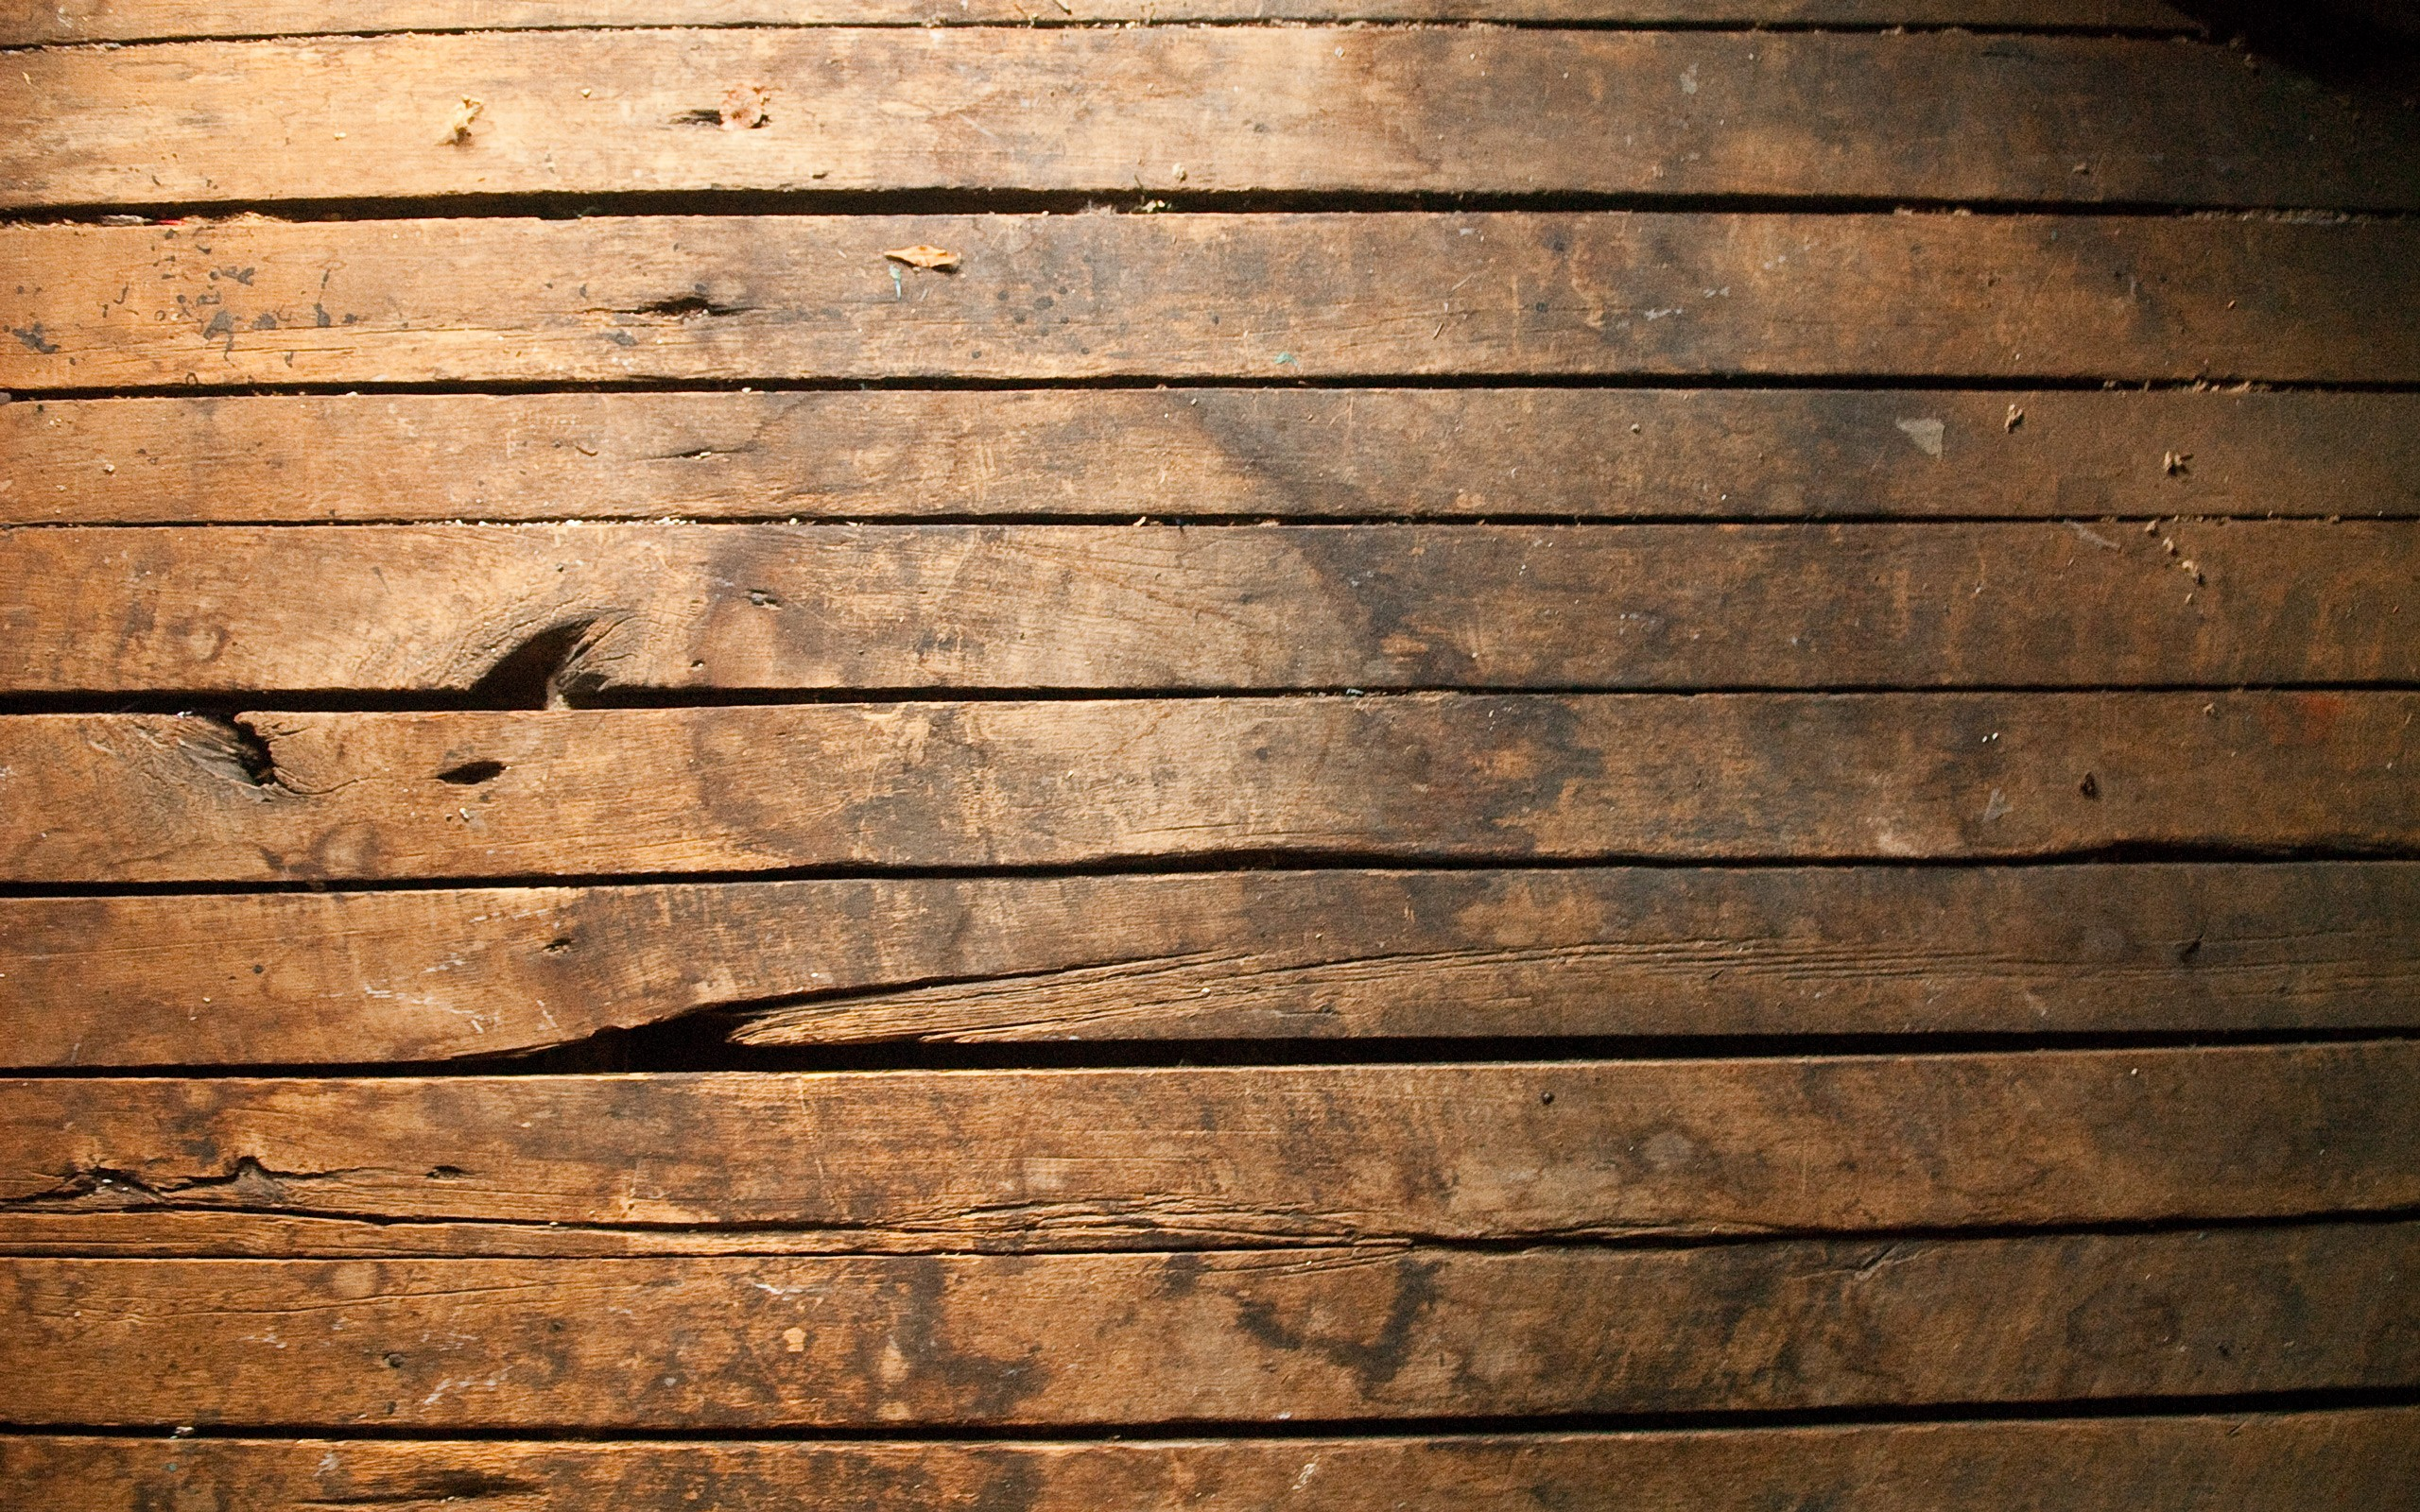 Odell Beckham Jr Wallpaper Iphone Vintage Rustic Wood Background 183 ① Download Free Amazing